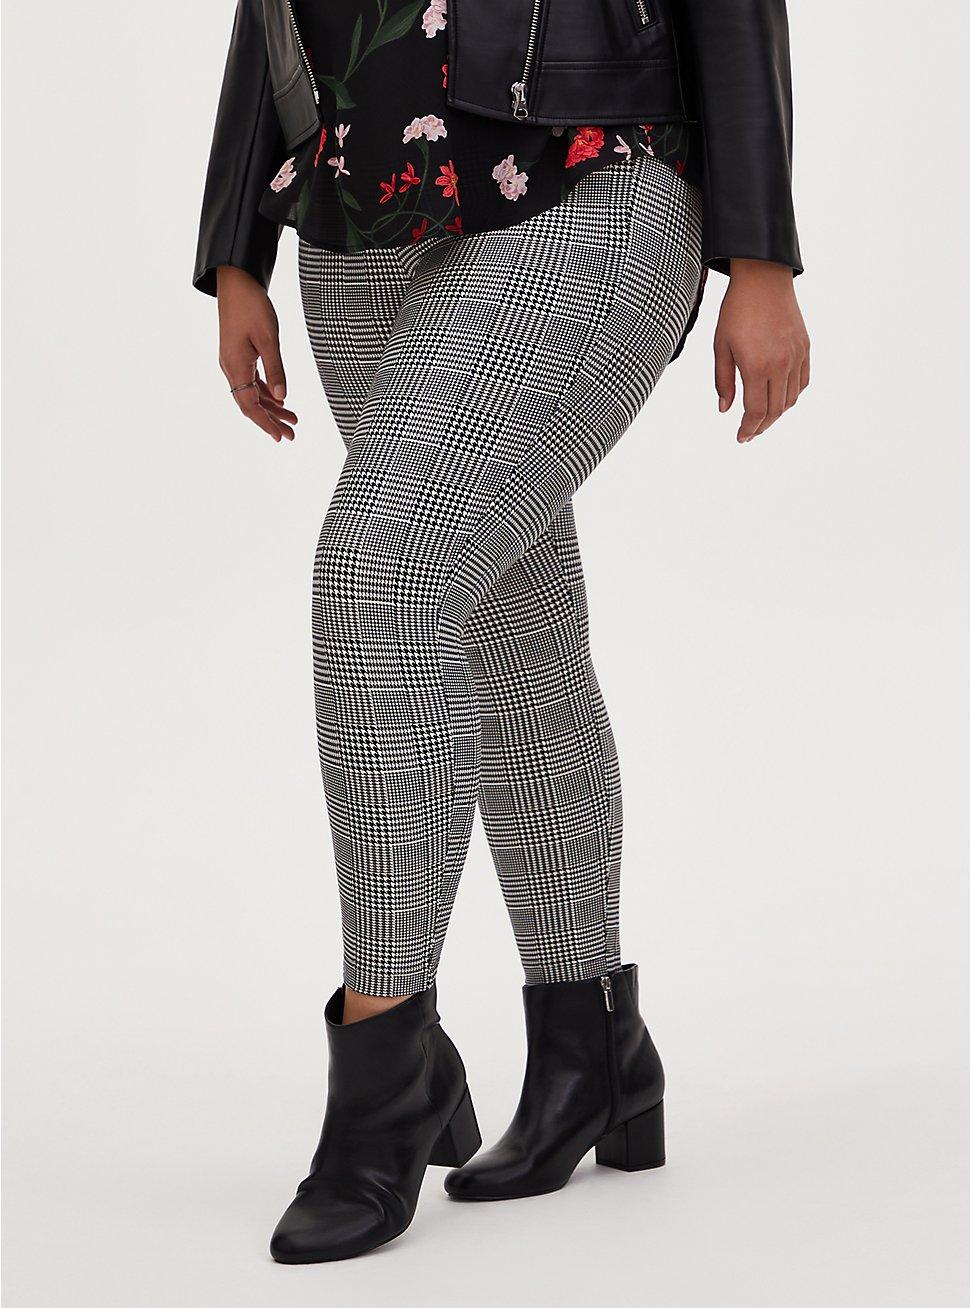 Studio Ponte Slim Fix Grey Plaid Pull-On Pixie Pant, PLAID - BLACK, hi-res